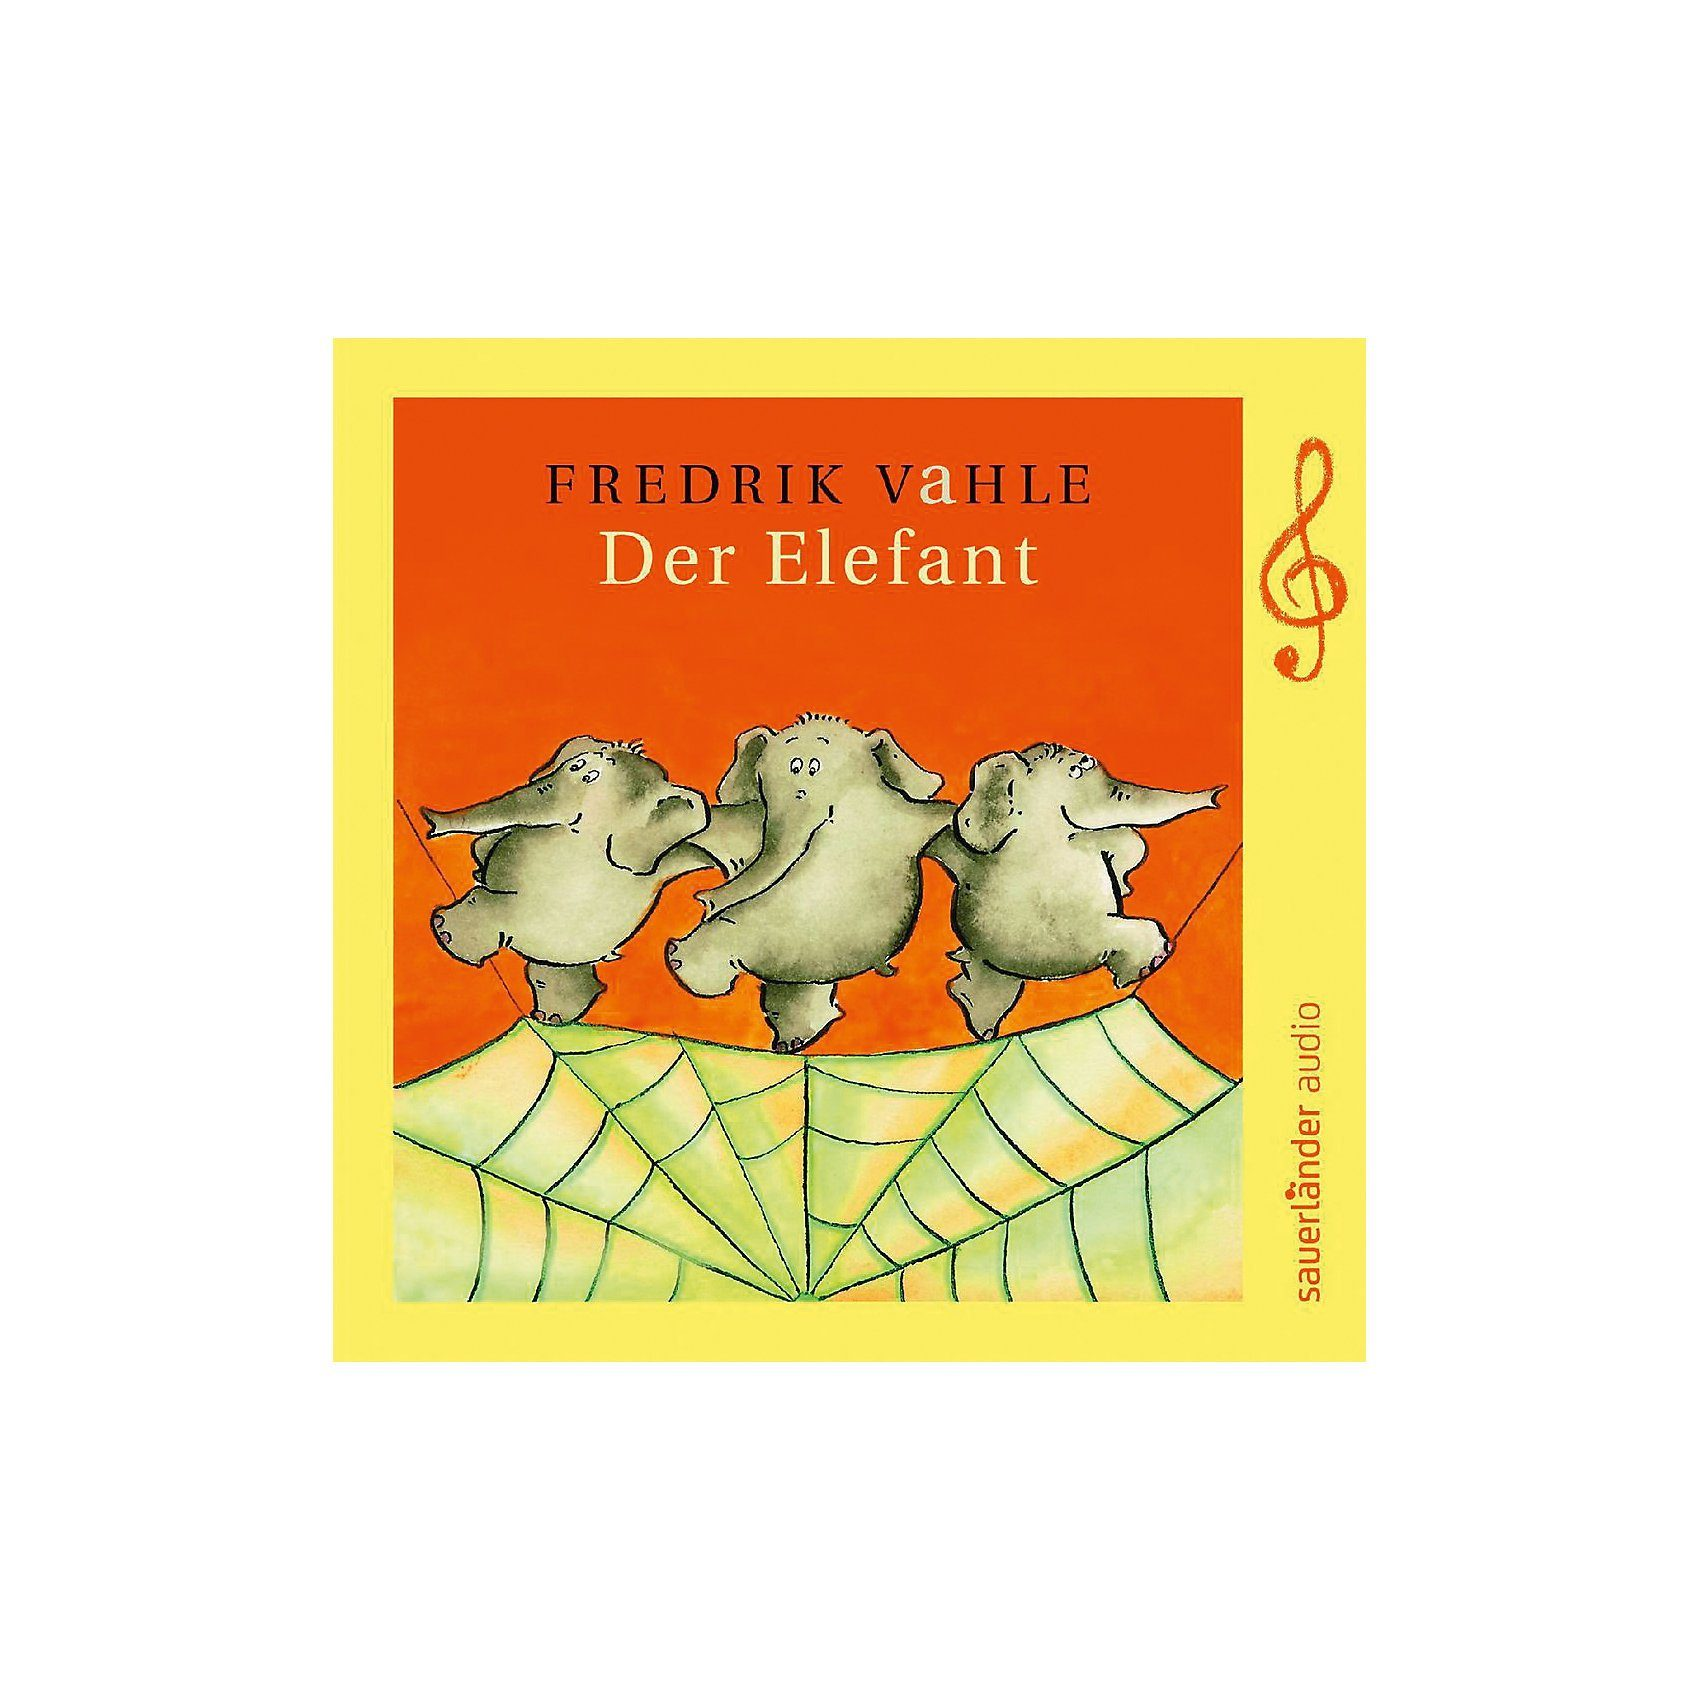 Edel CD Fredrik Vahle - Der Elefant